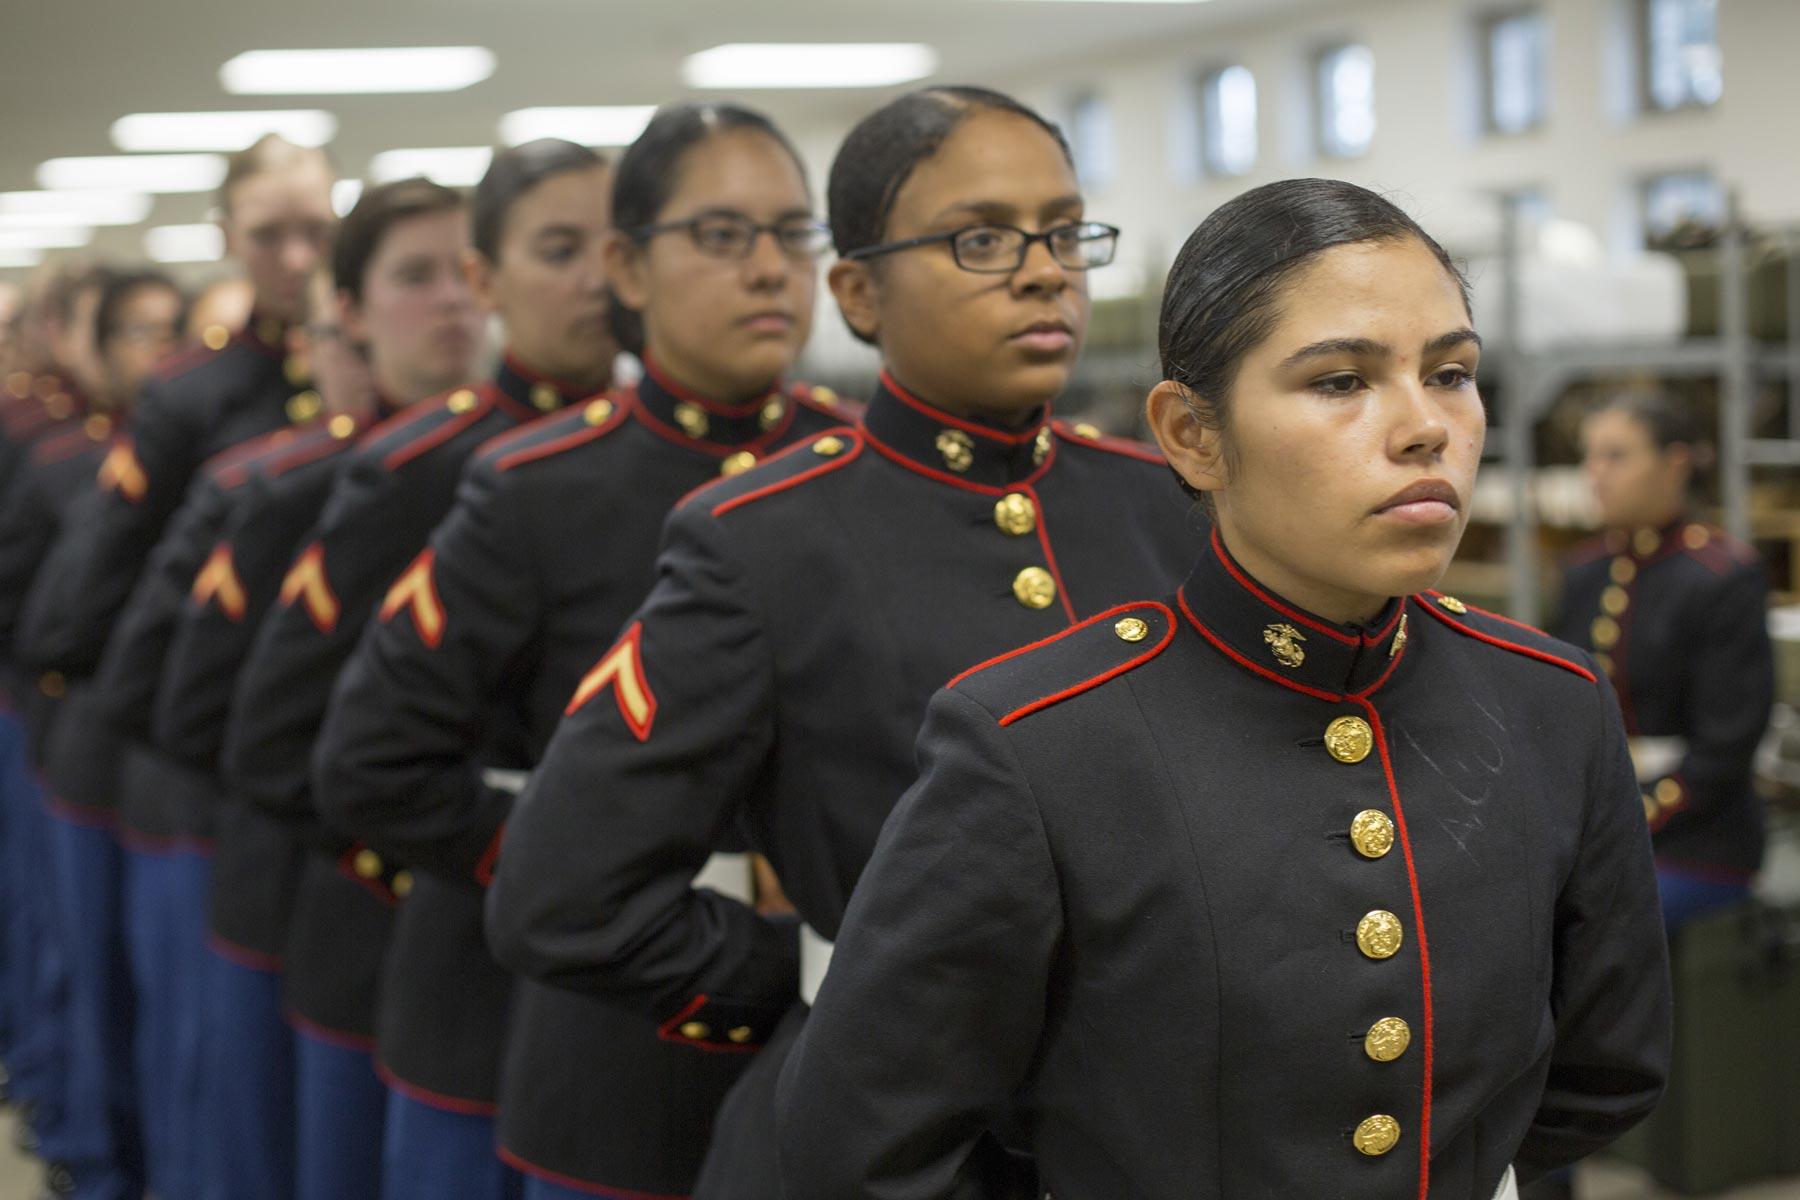 first class of female marine recruits graduates in new